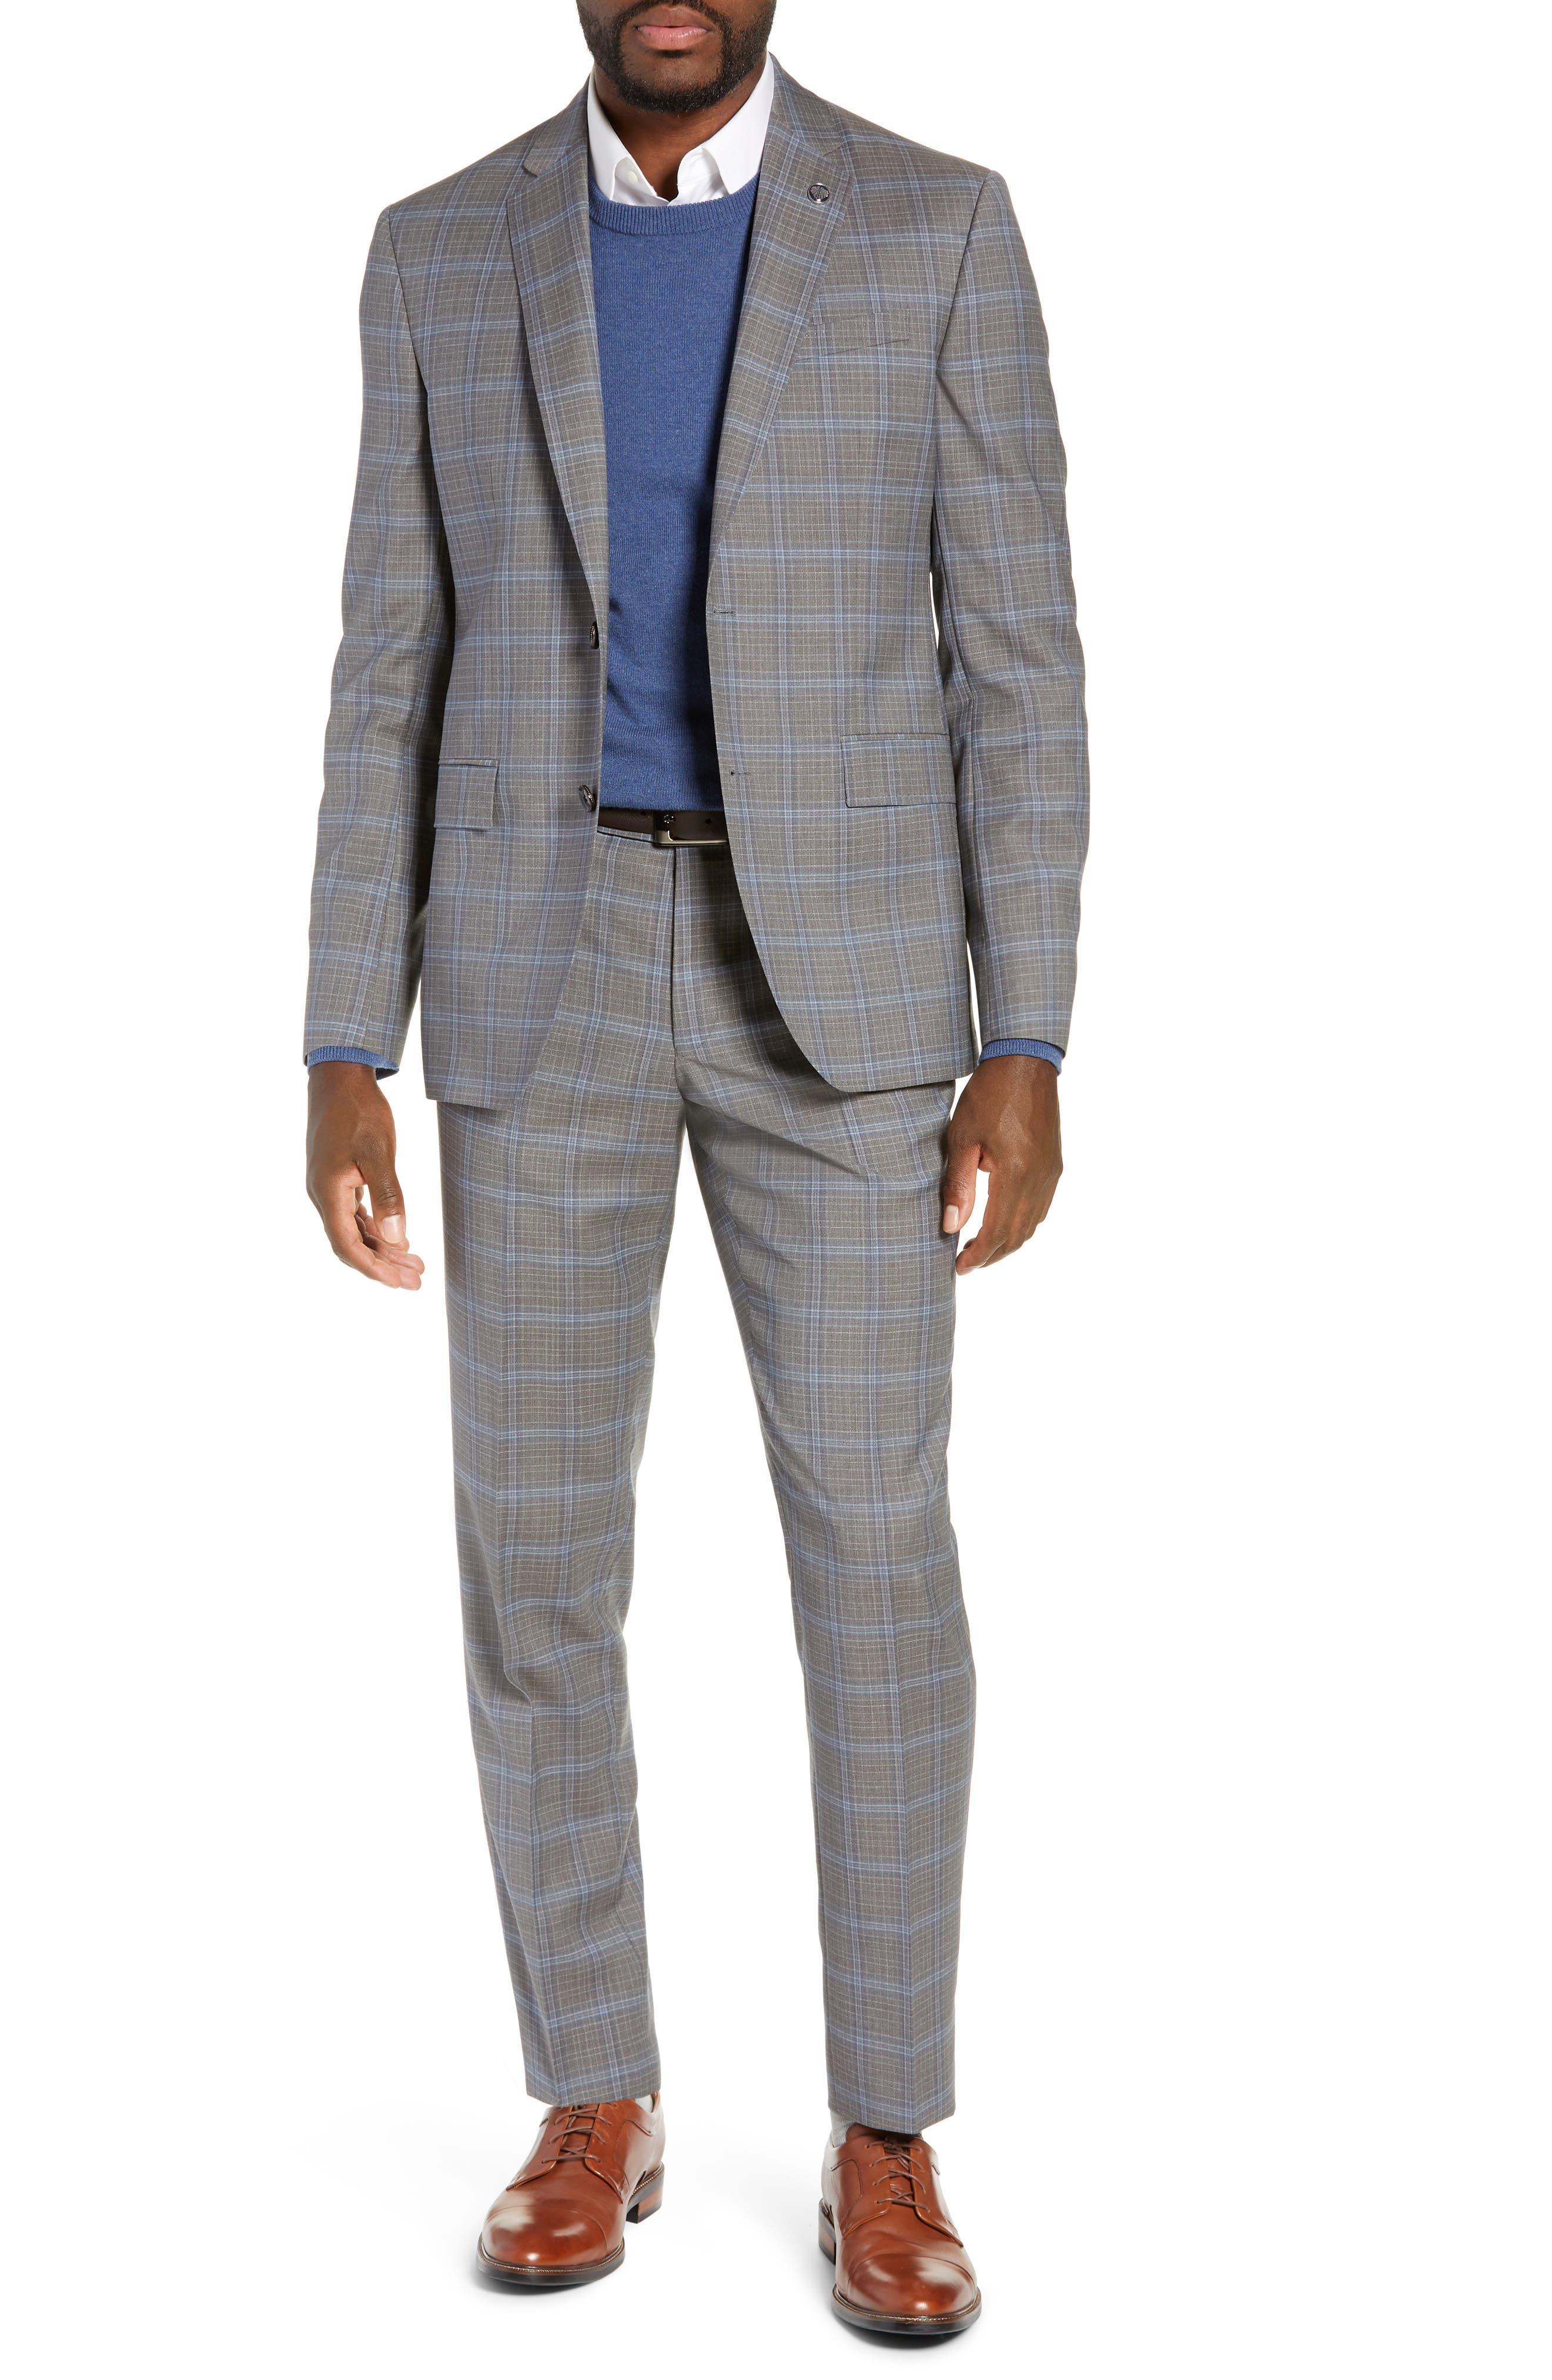 TED BAKER LONDON, Jay Trim Fit Plaid Wool Suit, Main thumbnail 1, color, LIGHT GREY